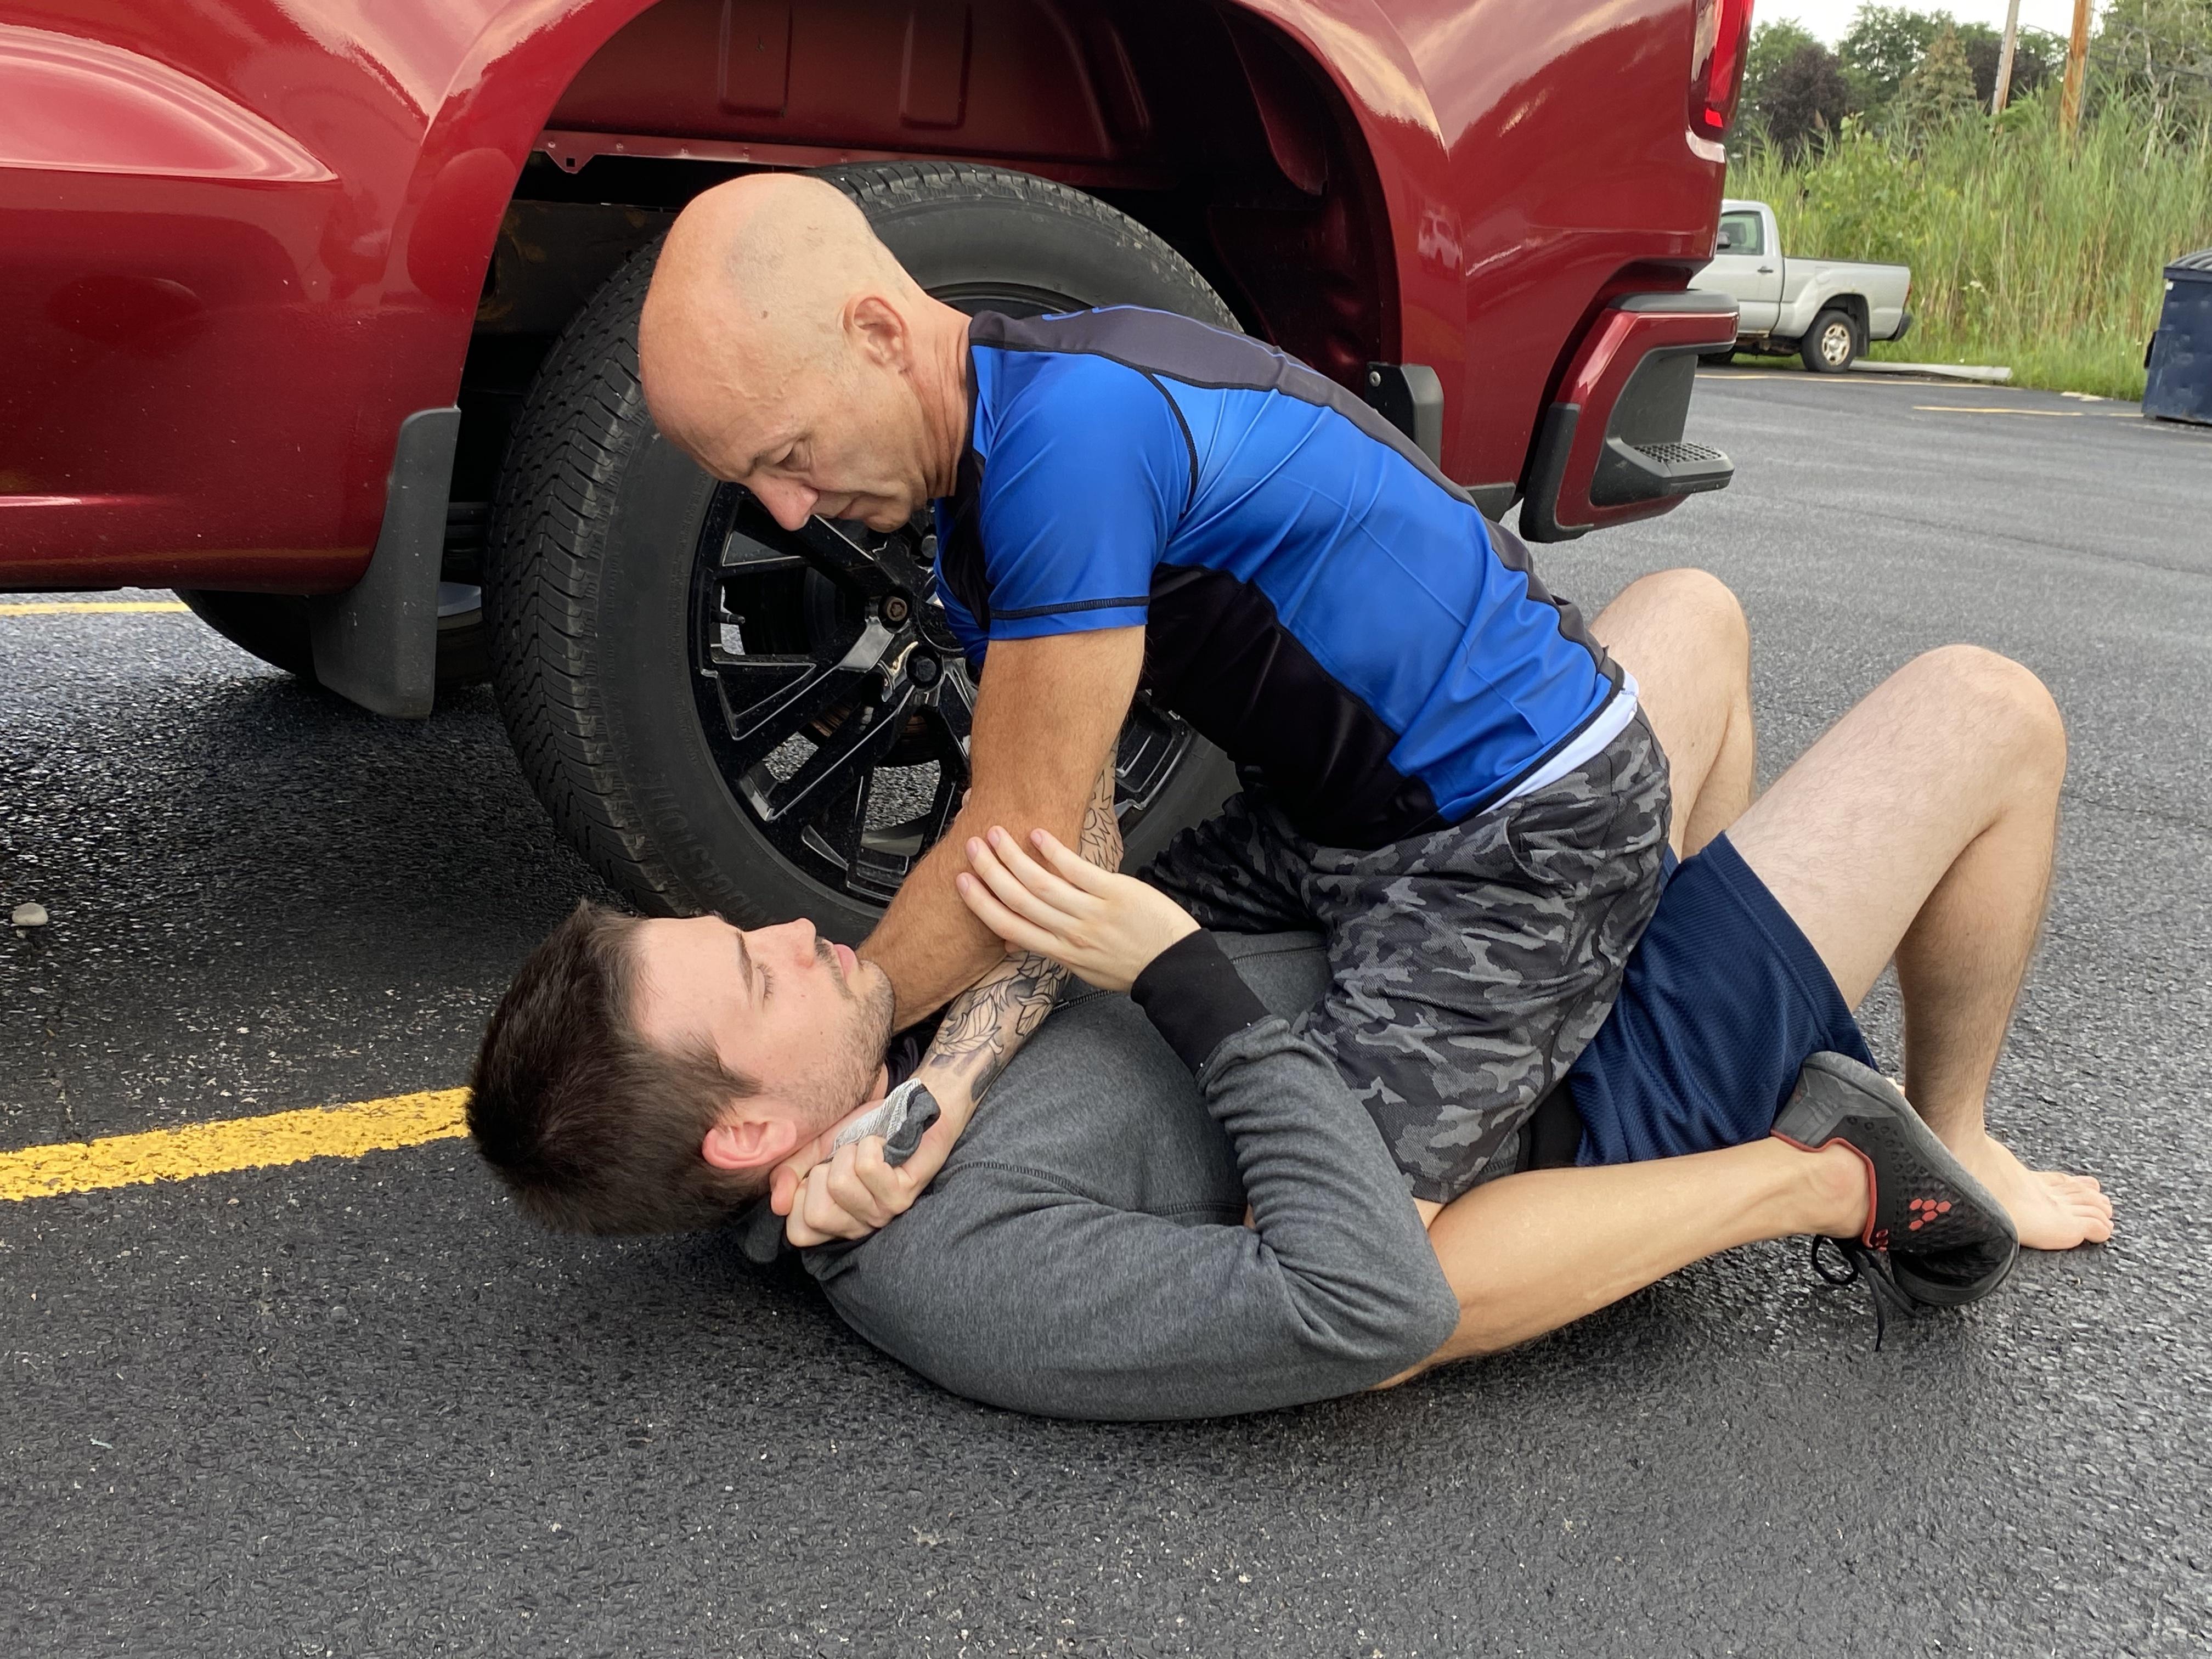 Woman practicing self-defense techniques against male attacker using Gracie jui jitsu